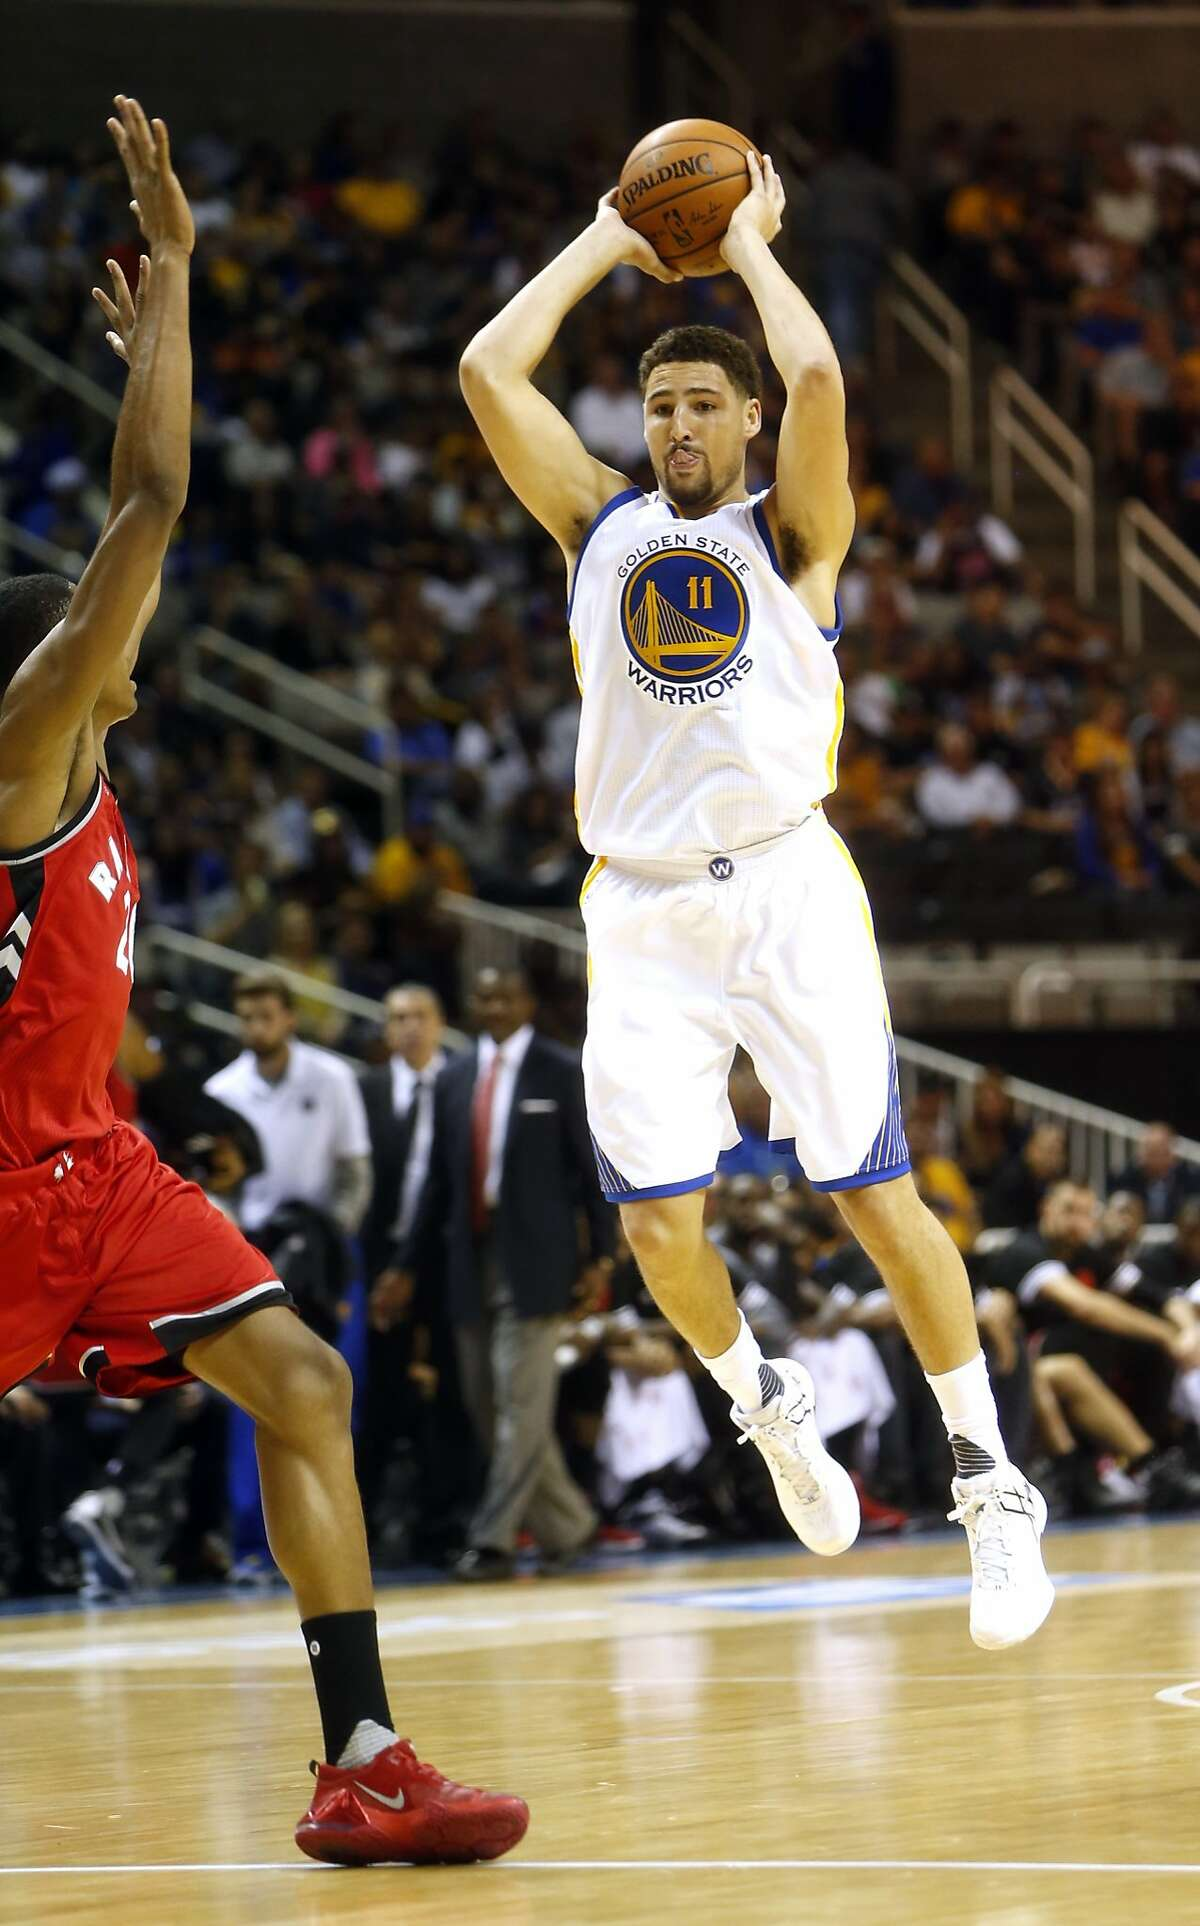 Golden State Warriors' Klay Thompson against Toronto Raptors during Warriors' 95-87 win in NBA preseason game at SAP Center in San Jose, Calif., on Monday, October 5, 2015.